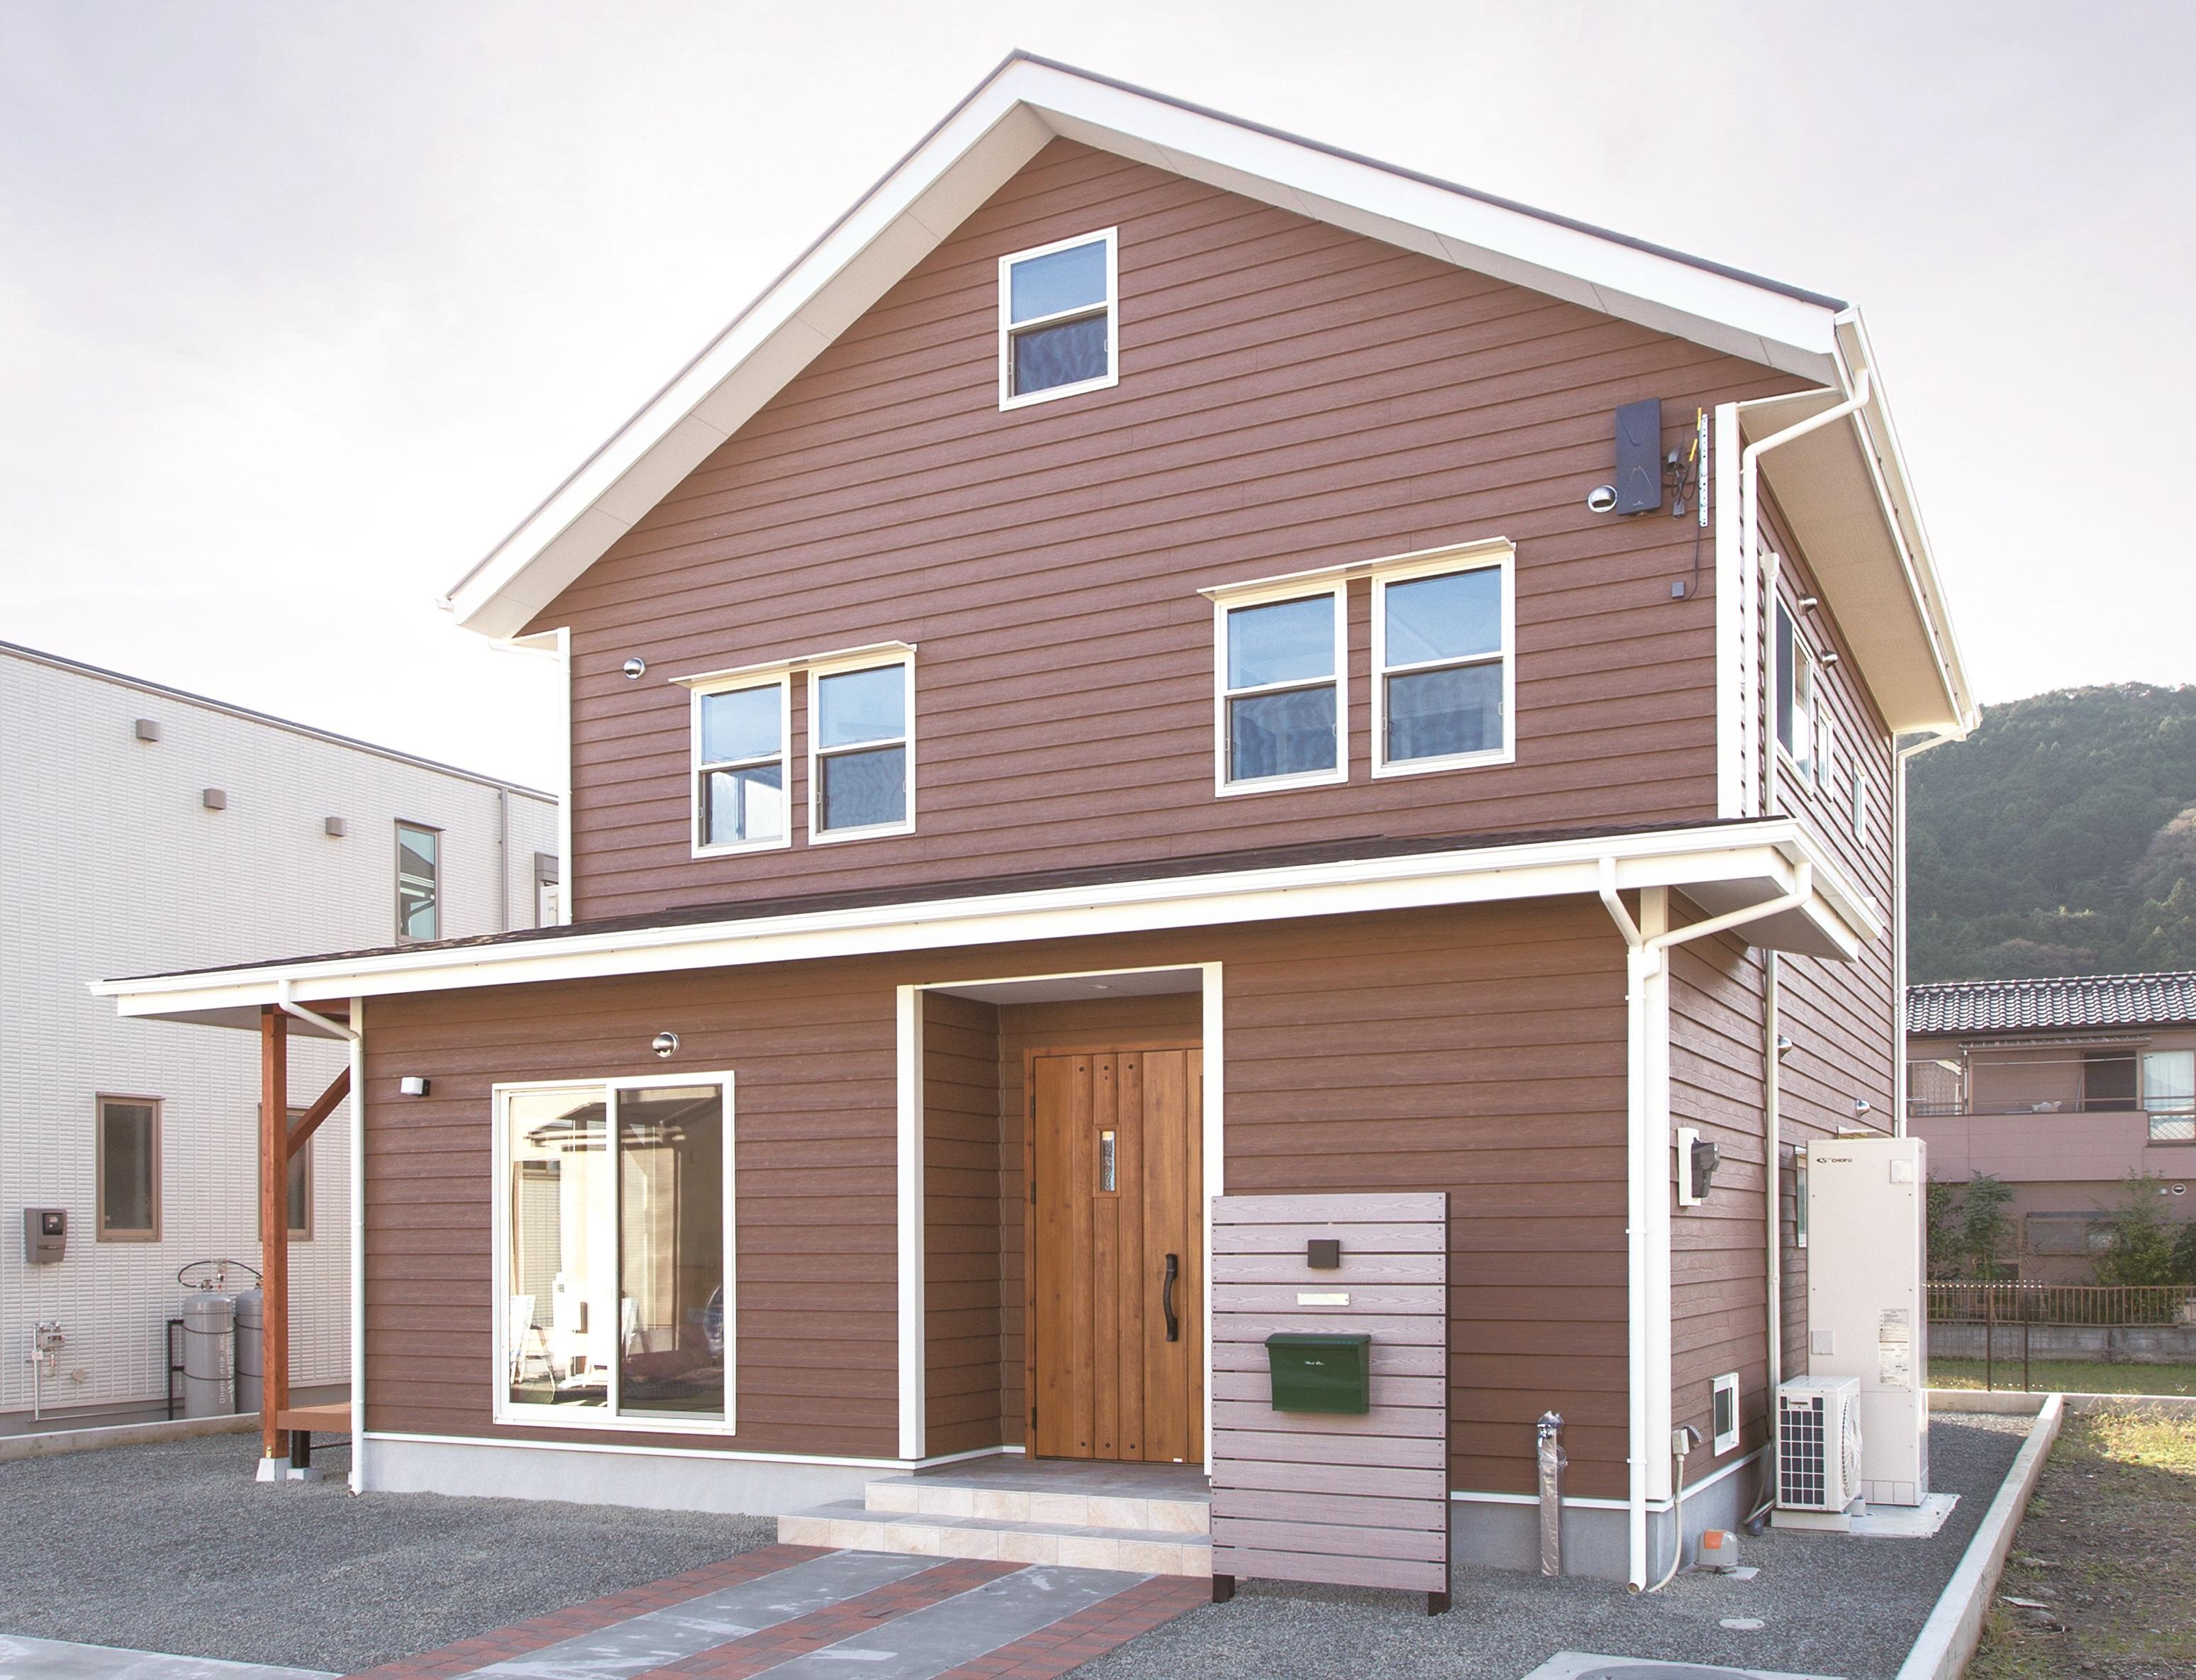 Ayami建築工房【二世帯住宅、間取り、輸入住宅】外観は甘すぎない、ボーイッシュなアメリカンスタイル